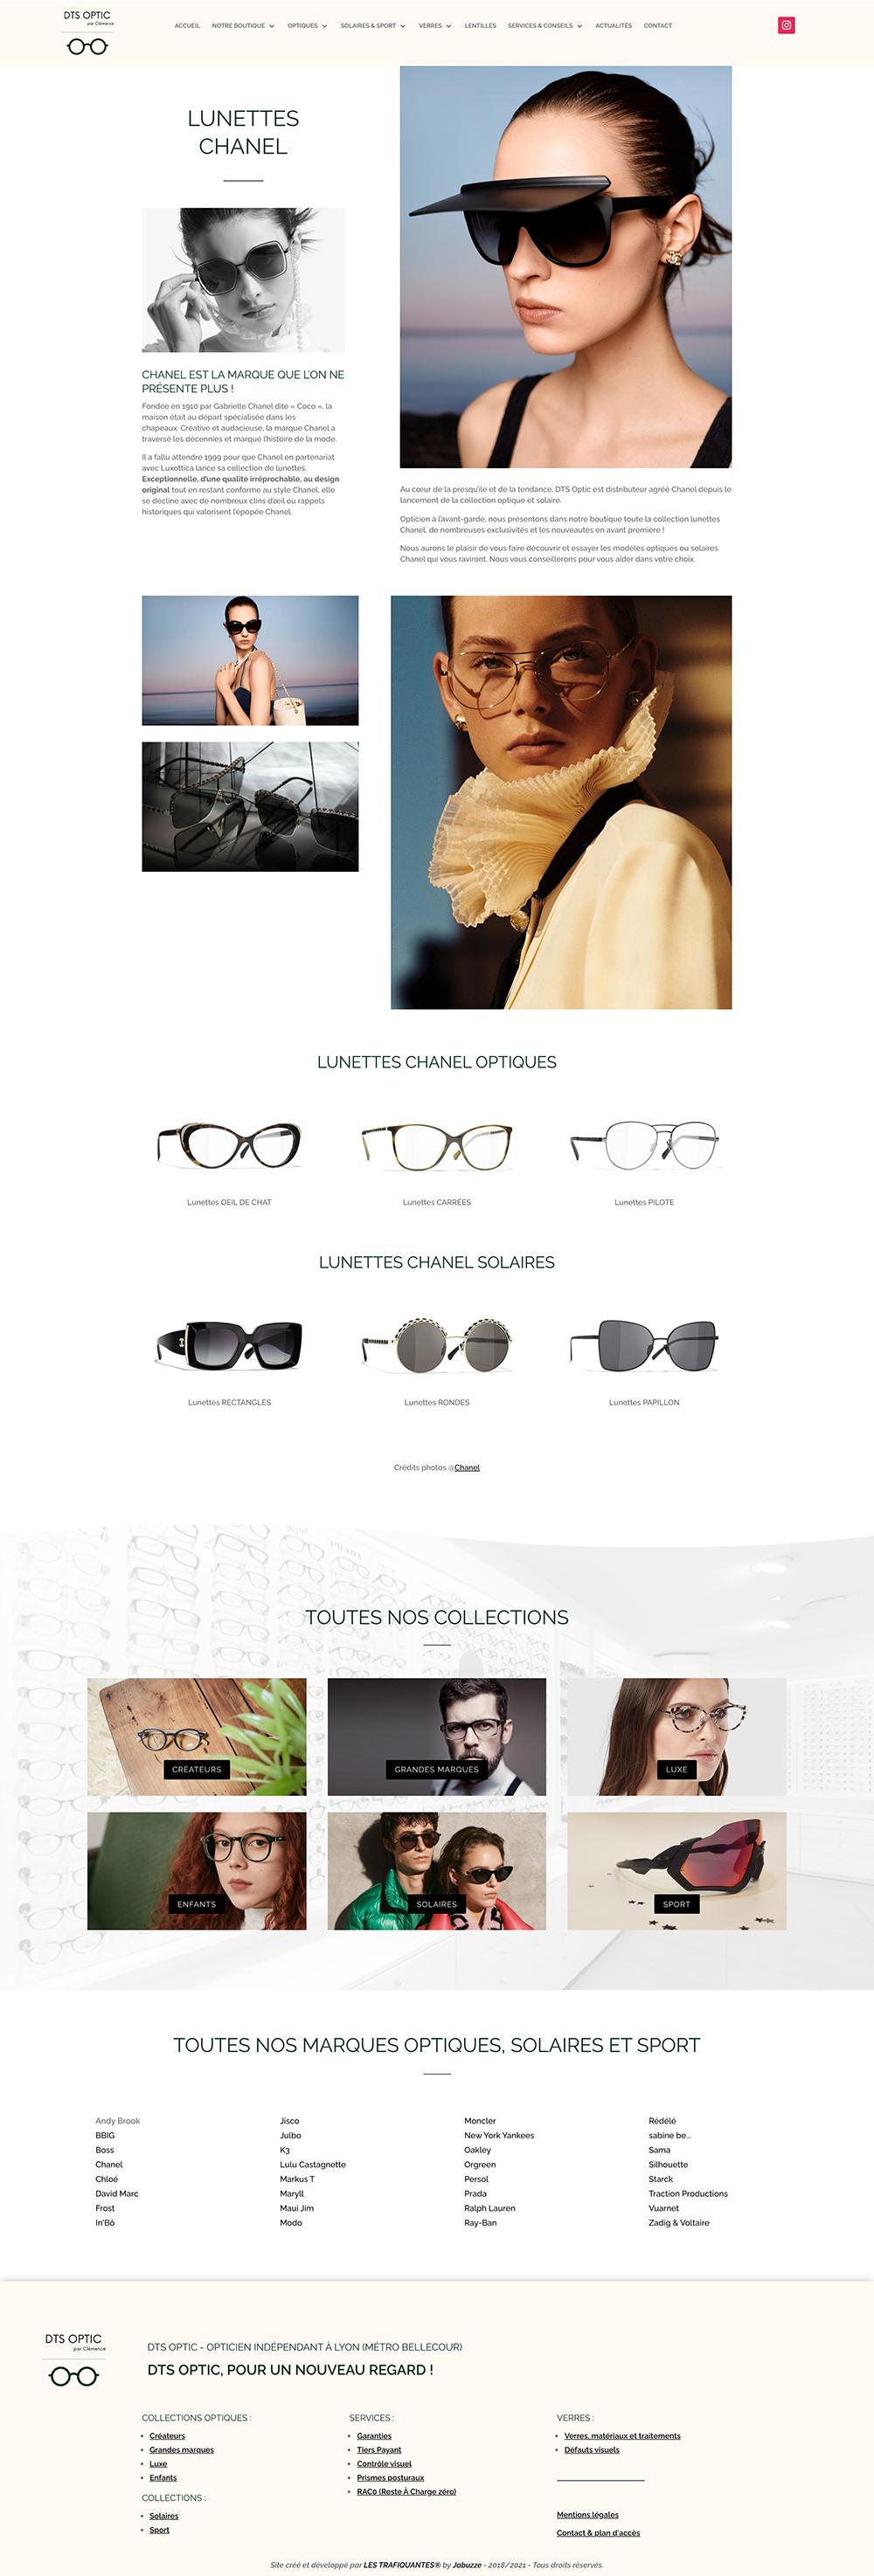 site web dts optic 2021